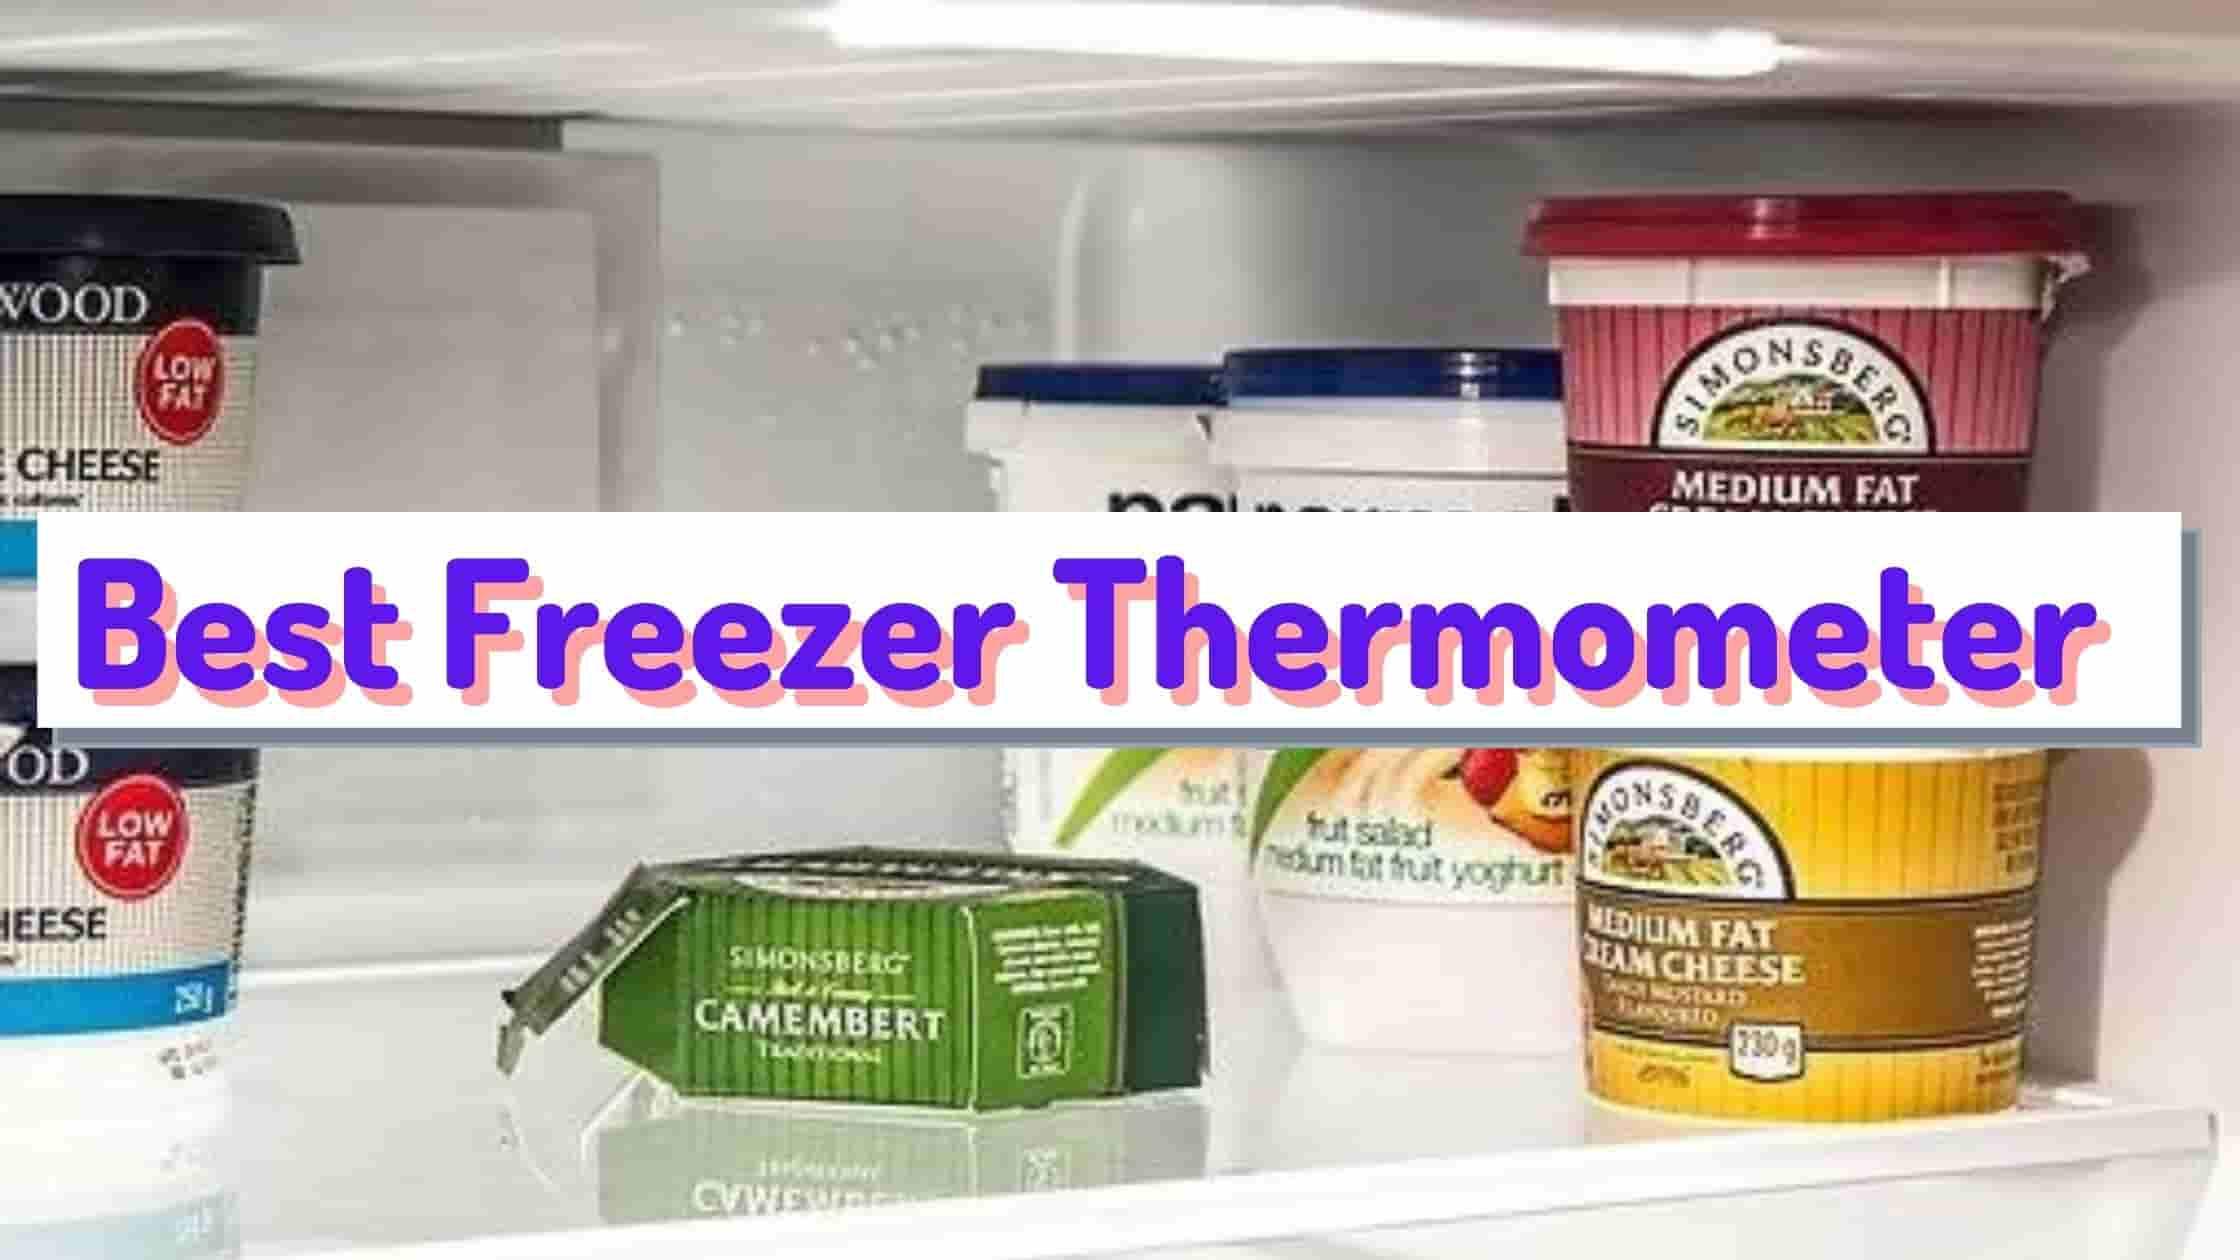 Best Freezer Thermometer